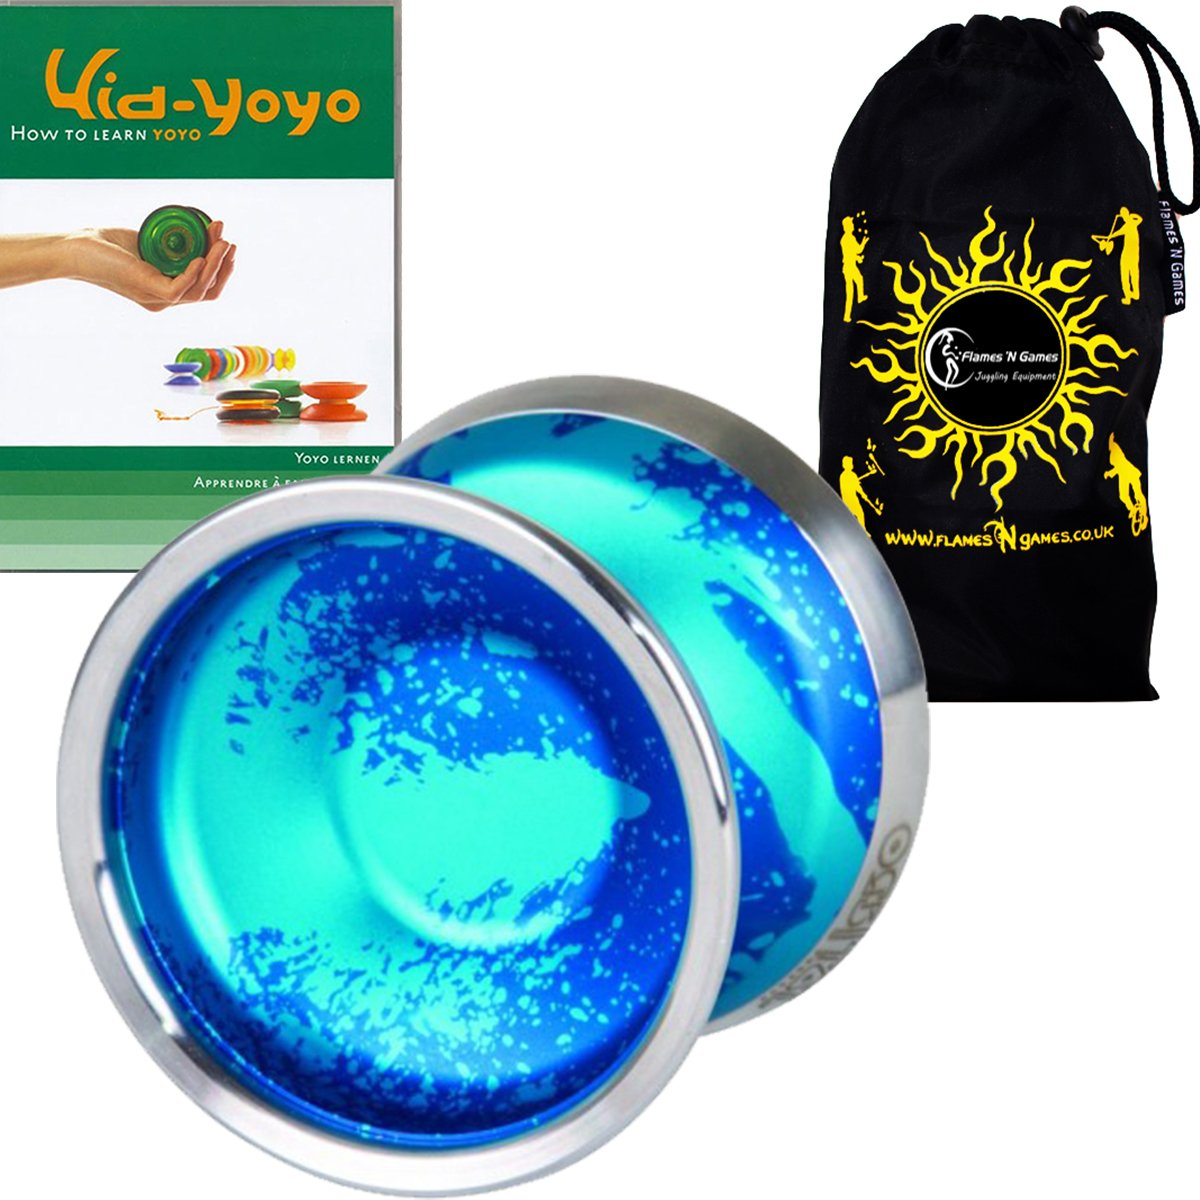 Duncan Orbital Medium Advanced Competition Model Yoyo - Supreme Quality Aluminium Medium Yo Yo For 1A Tricks + Kid YoYo DVD + Travel Bag! Ideal Yo-Yo for Competitions Off All Ages